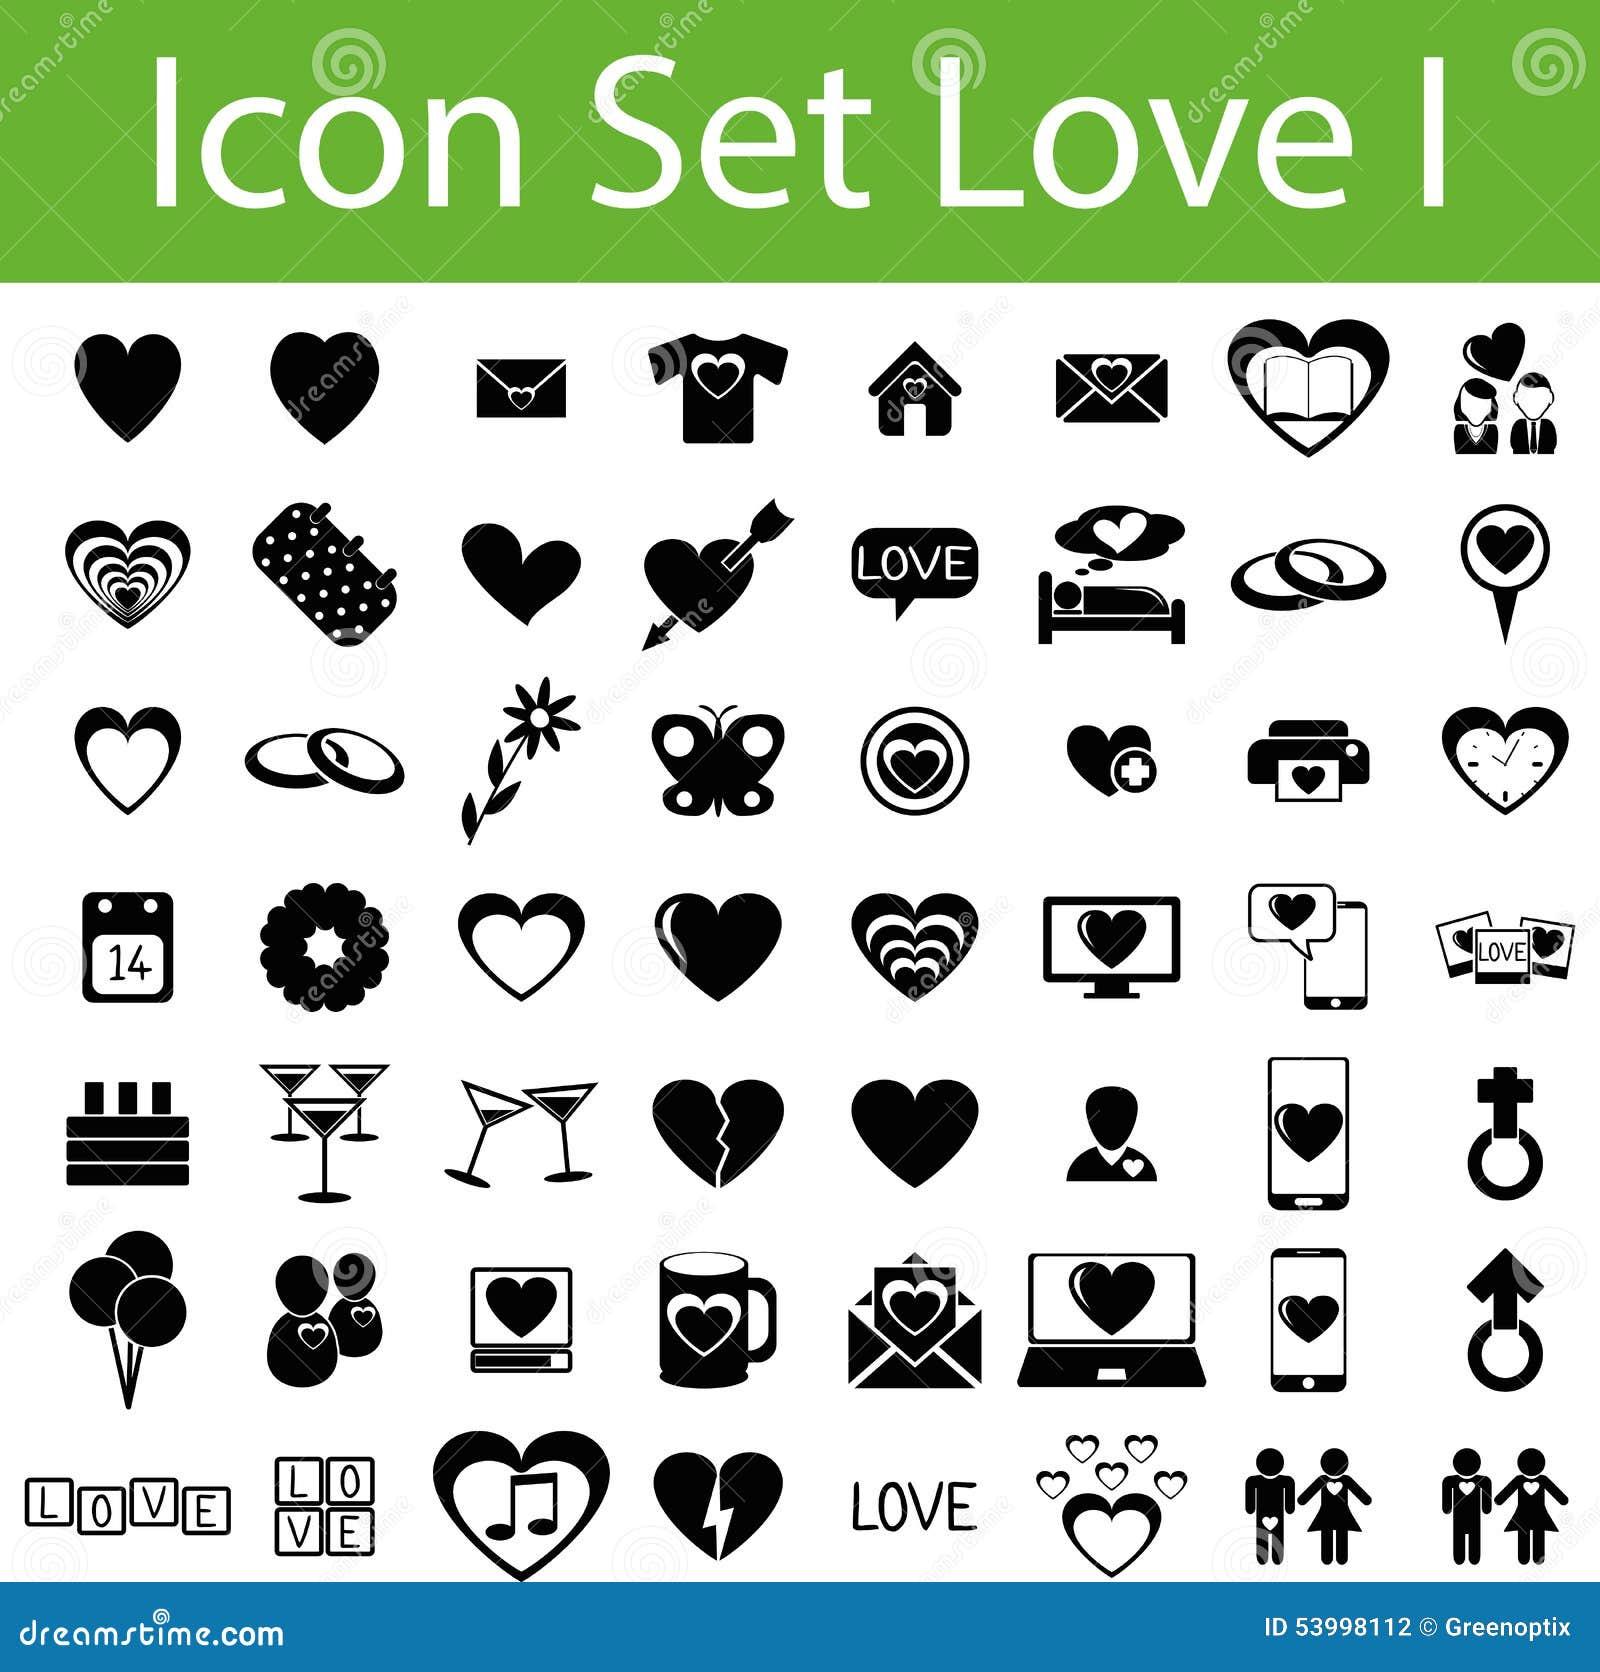 Icon Set Love